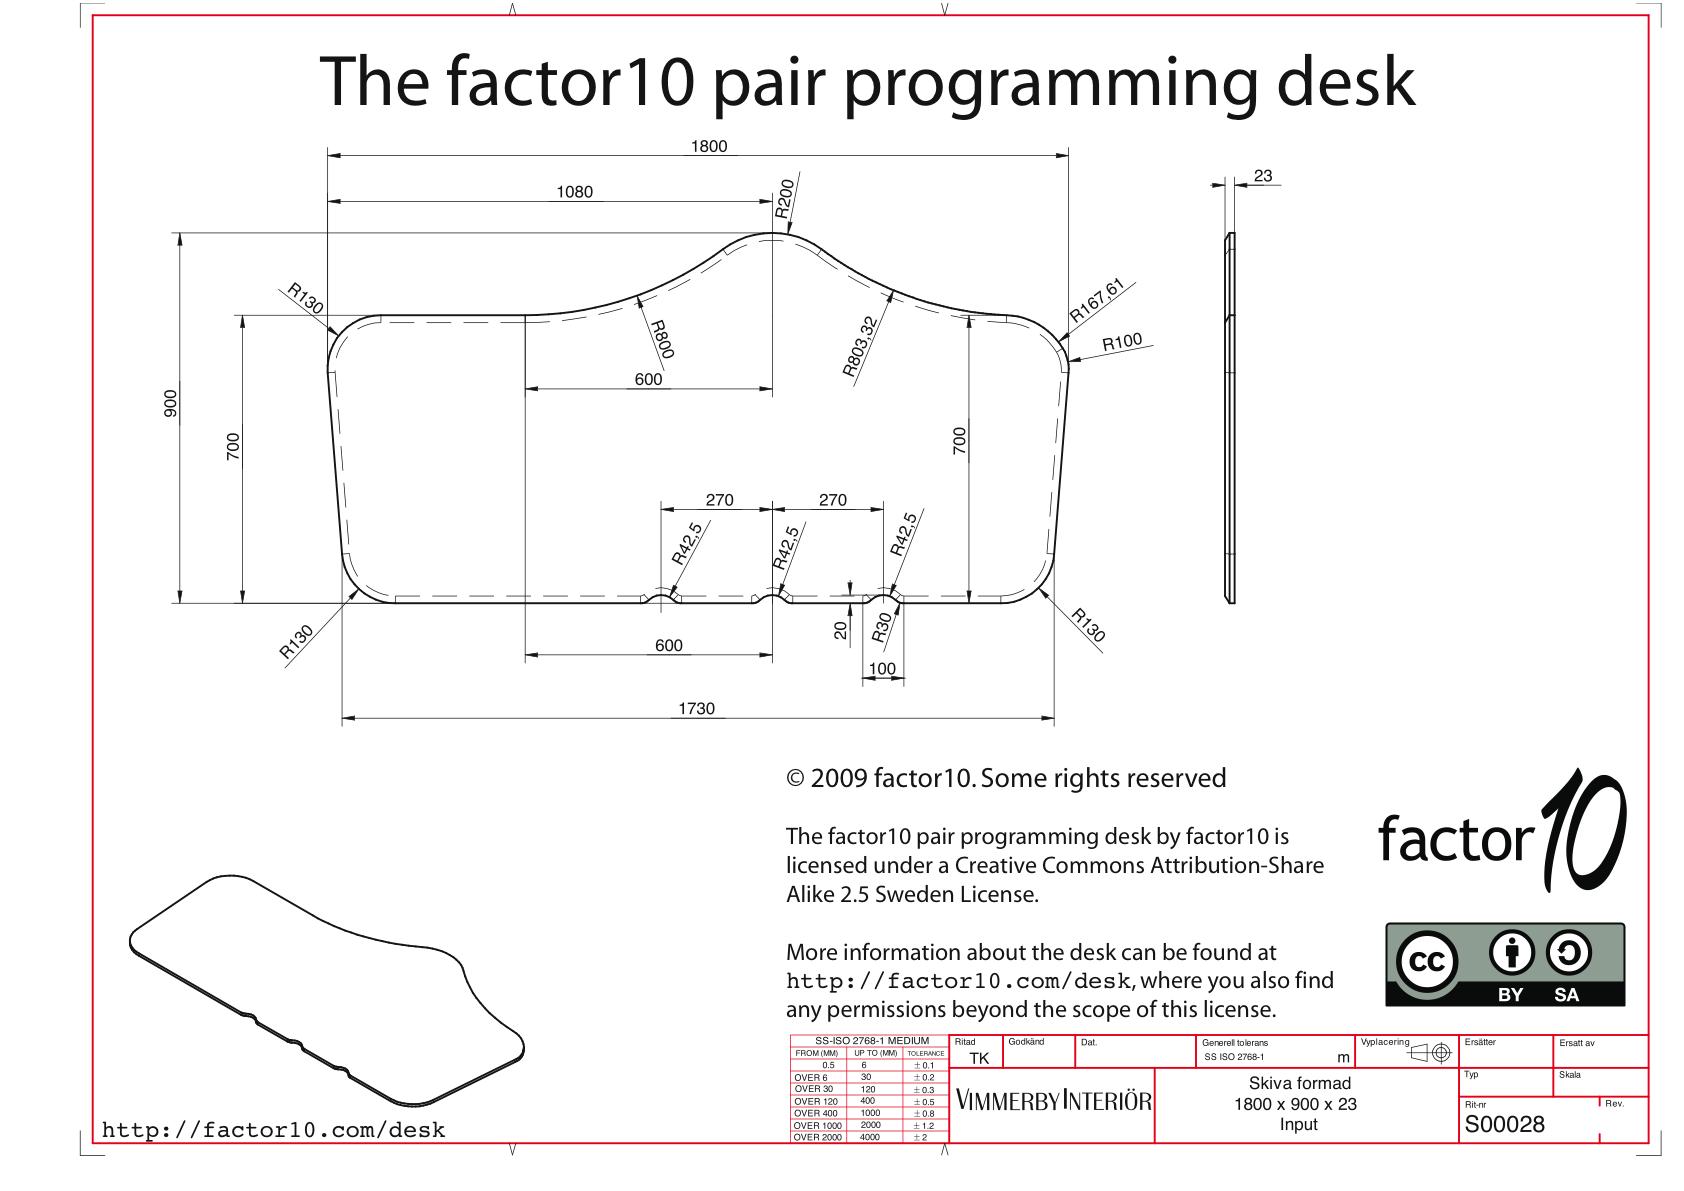 factor10 pair programming desk